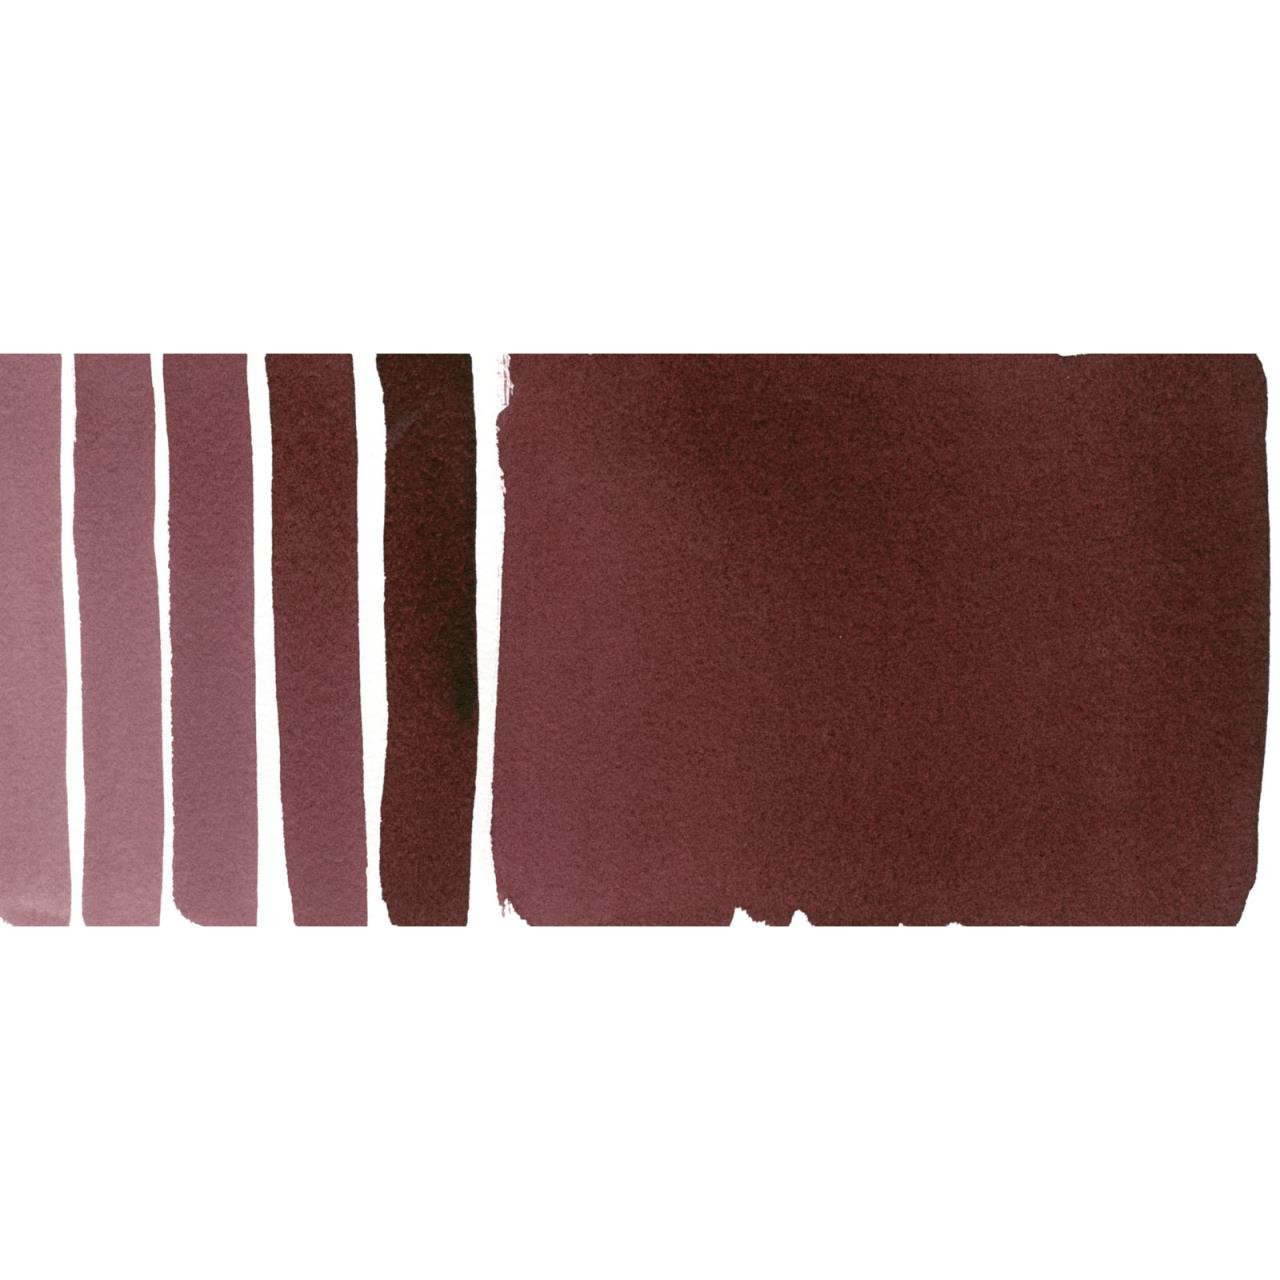 Naphthamide Maroon, DANIEL SMITH Extra Fine Watercolors 15ml Tubes -